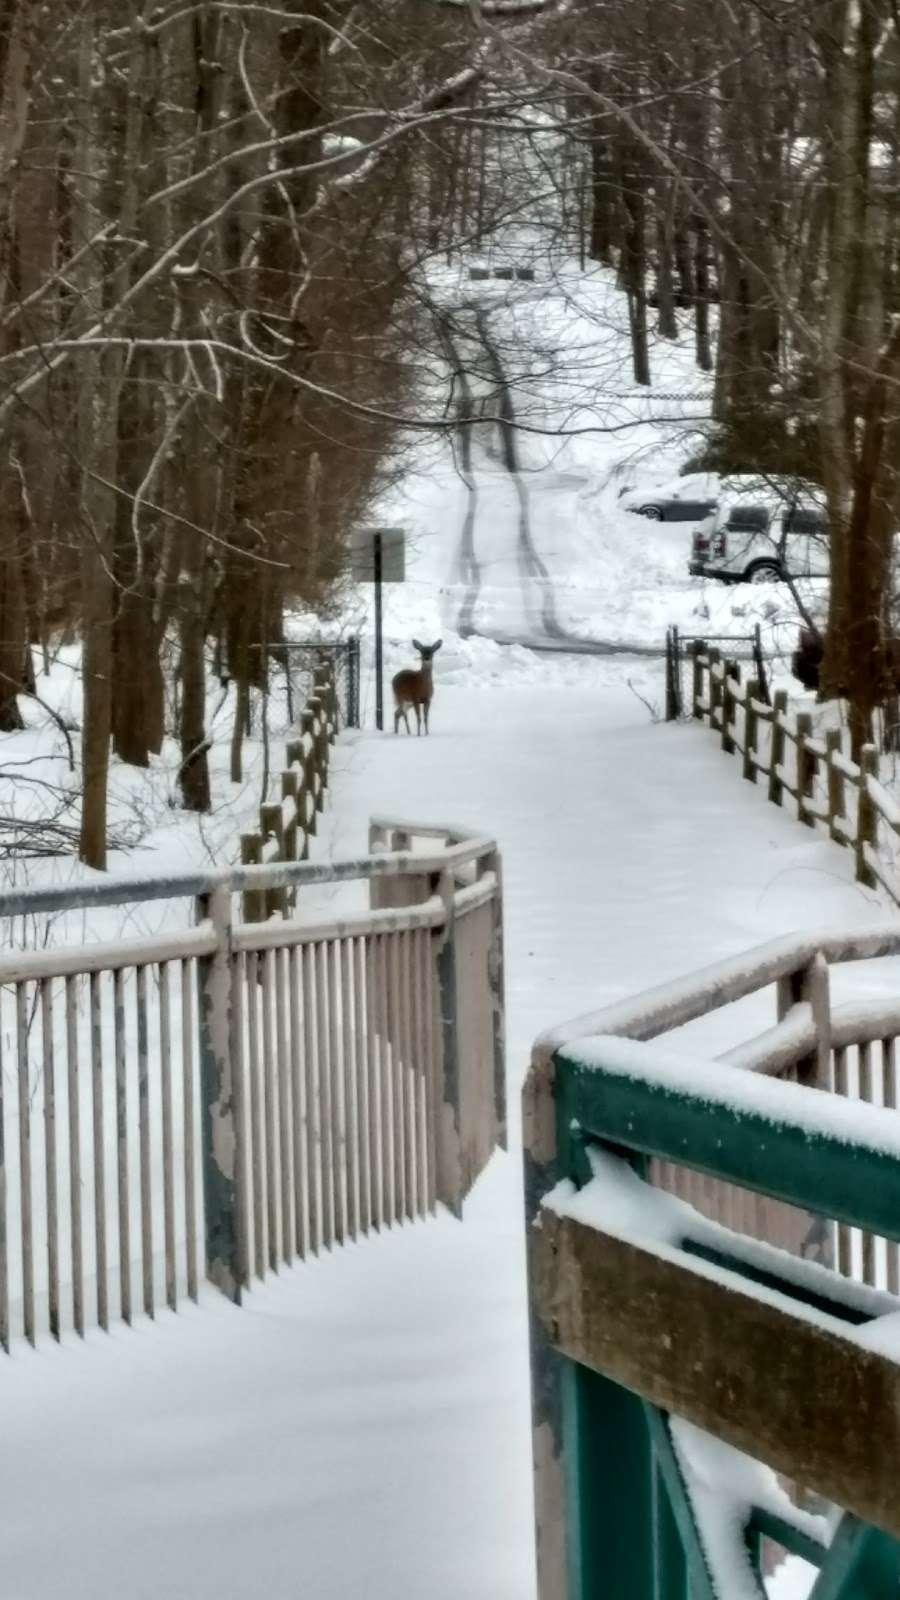 Flat Rock Brook Nature Center - park  | Photo 9 of 10 | Address: 288 Jones Rd, Englewood, NJ 07631, USA